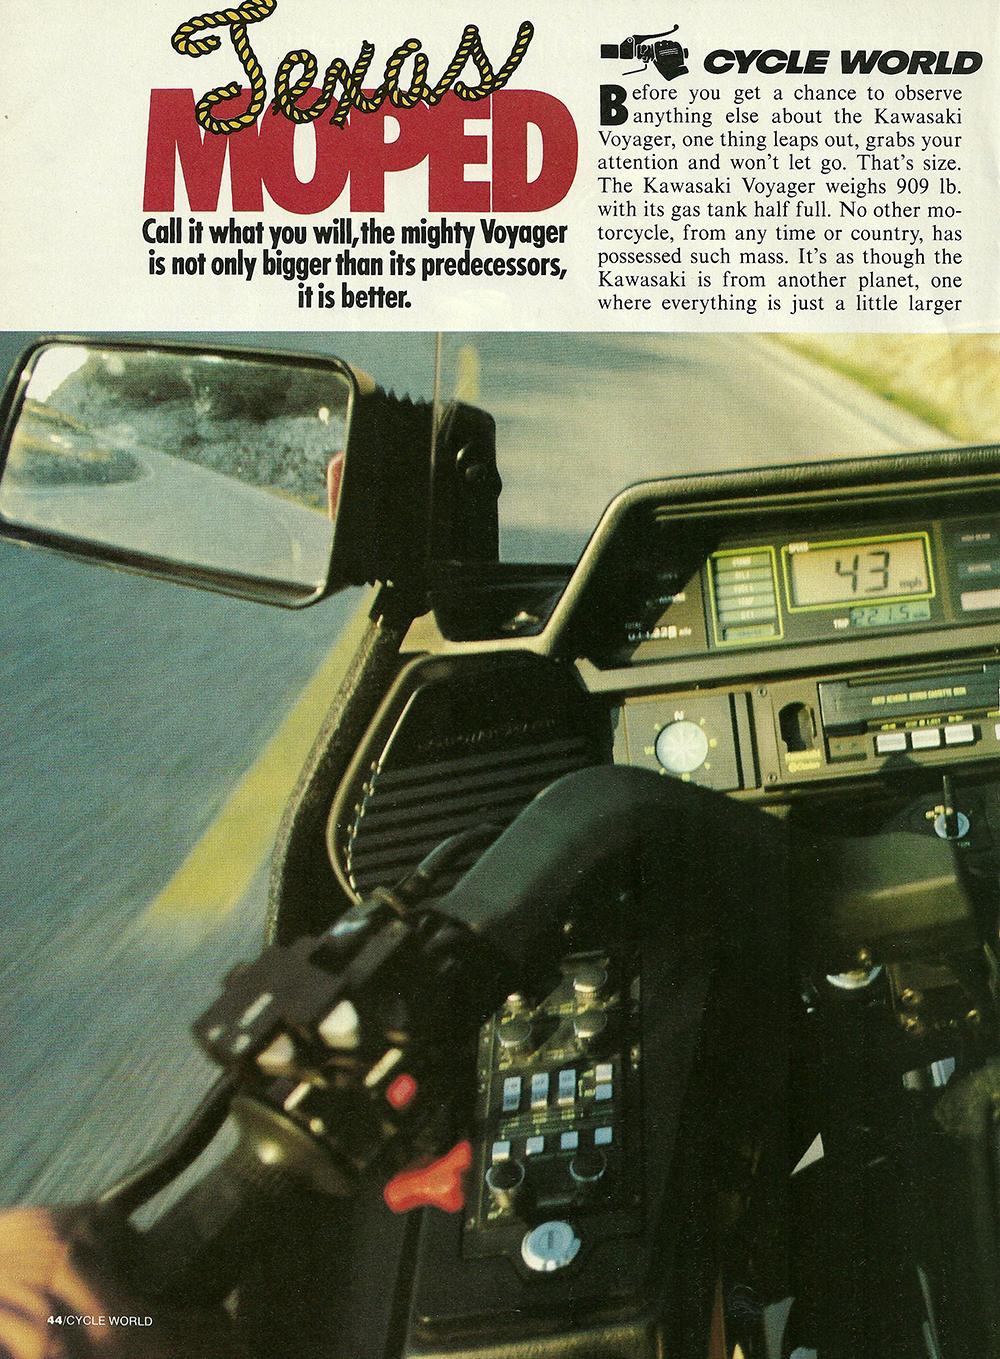 1983 Kawasaki Voyager 1300 road test 01.jpg